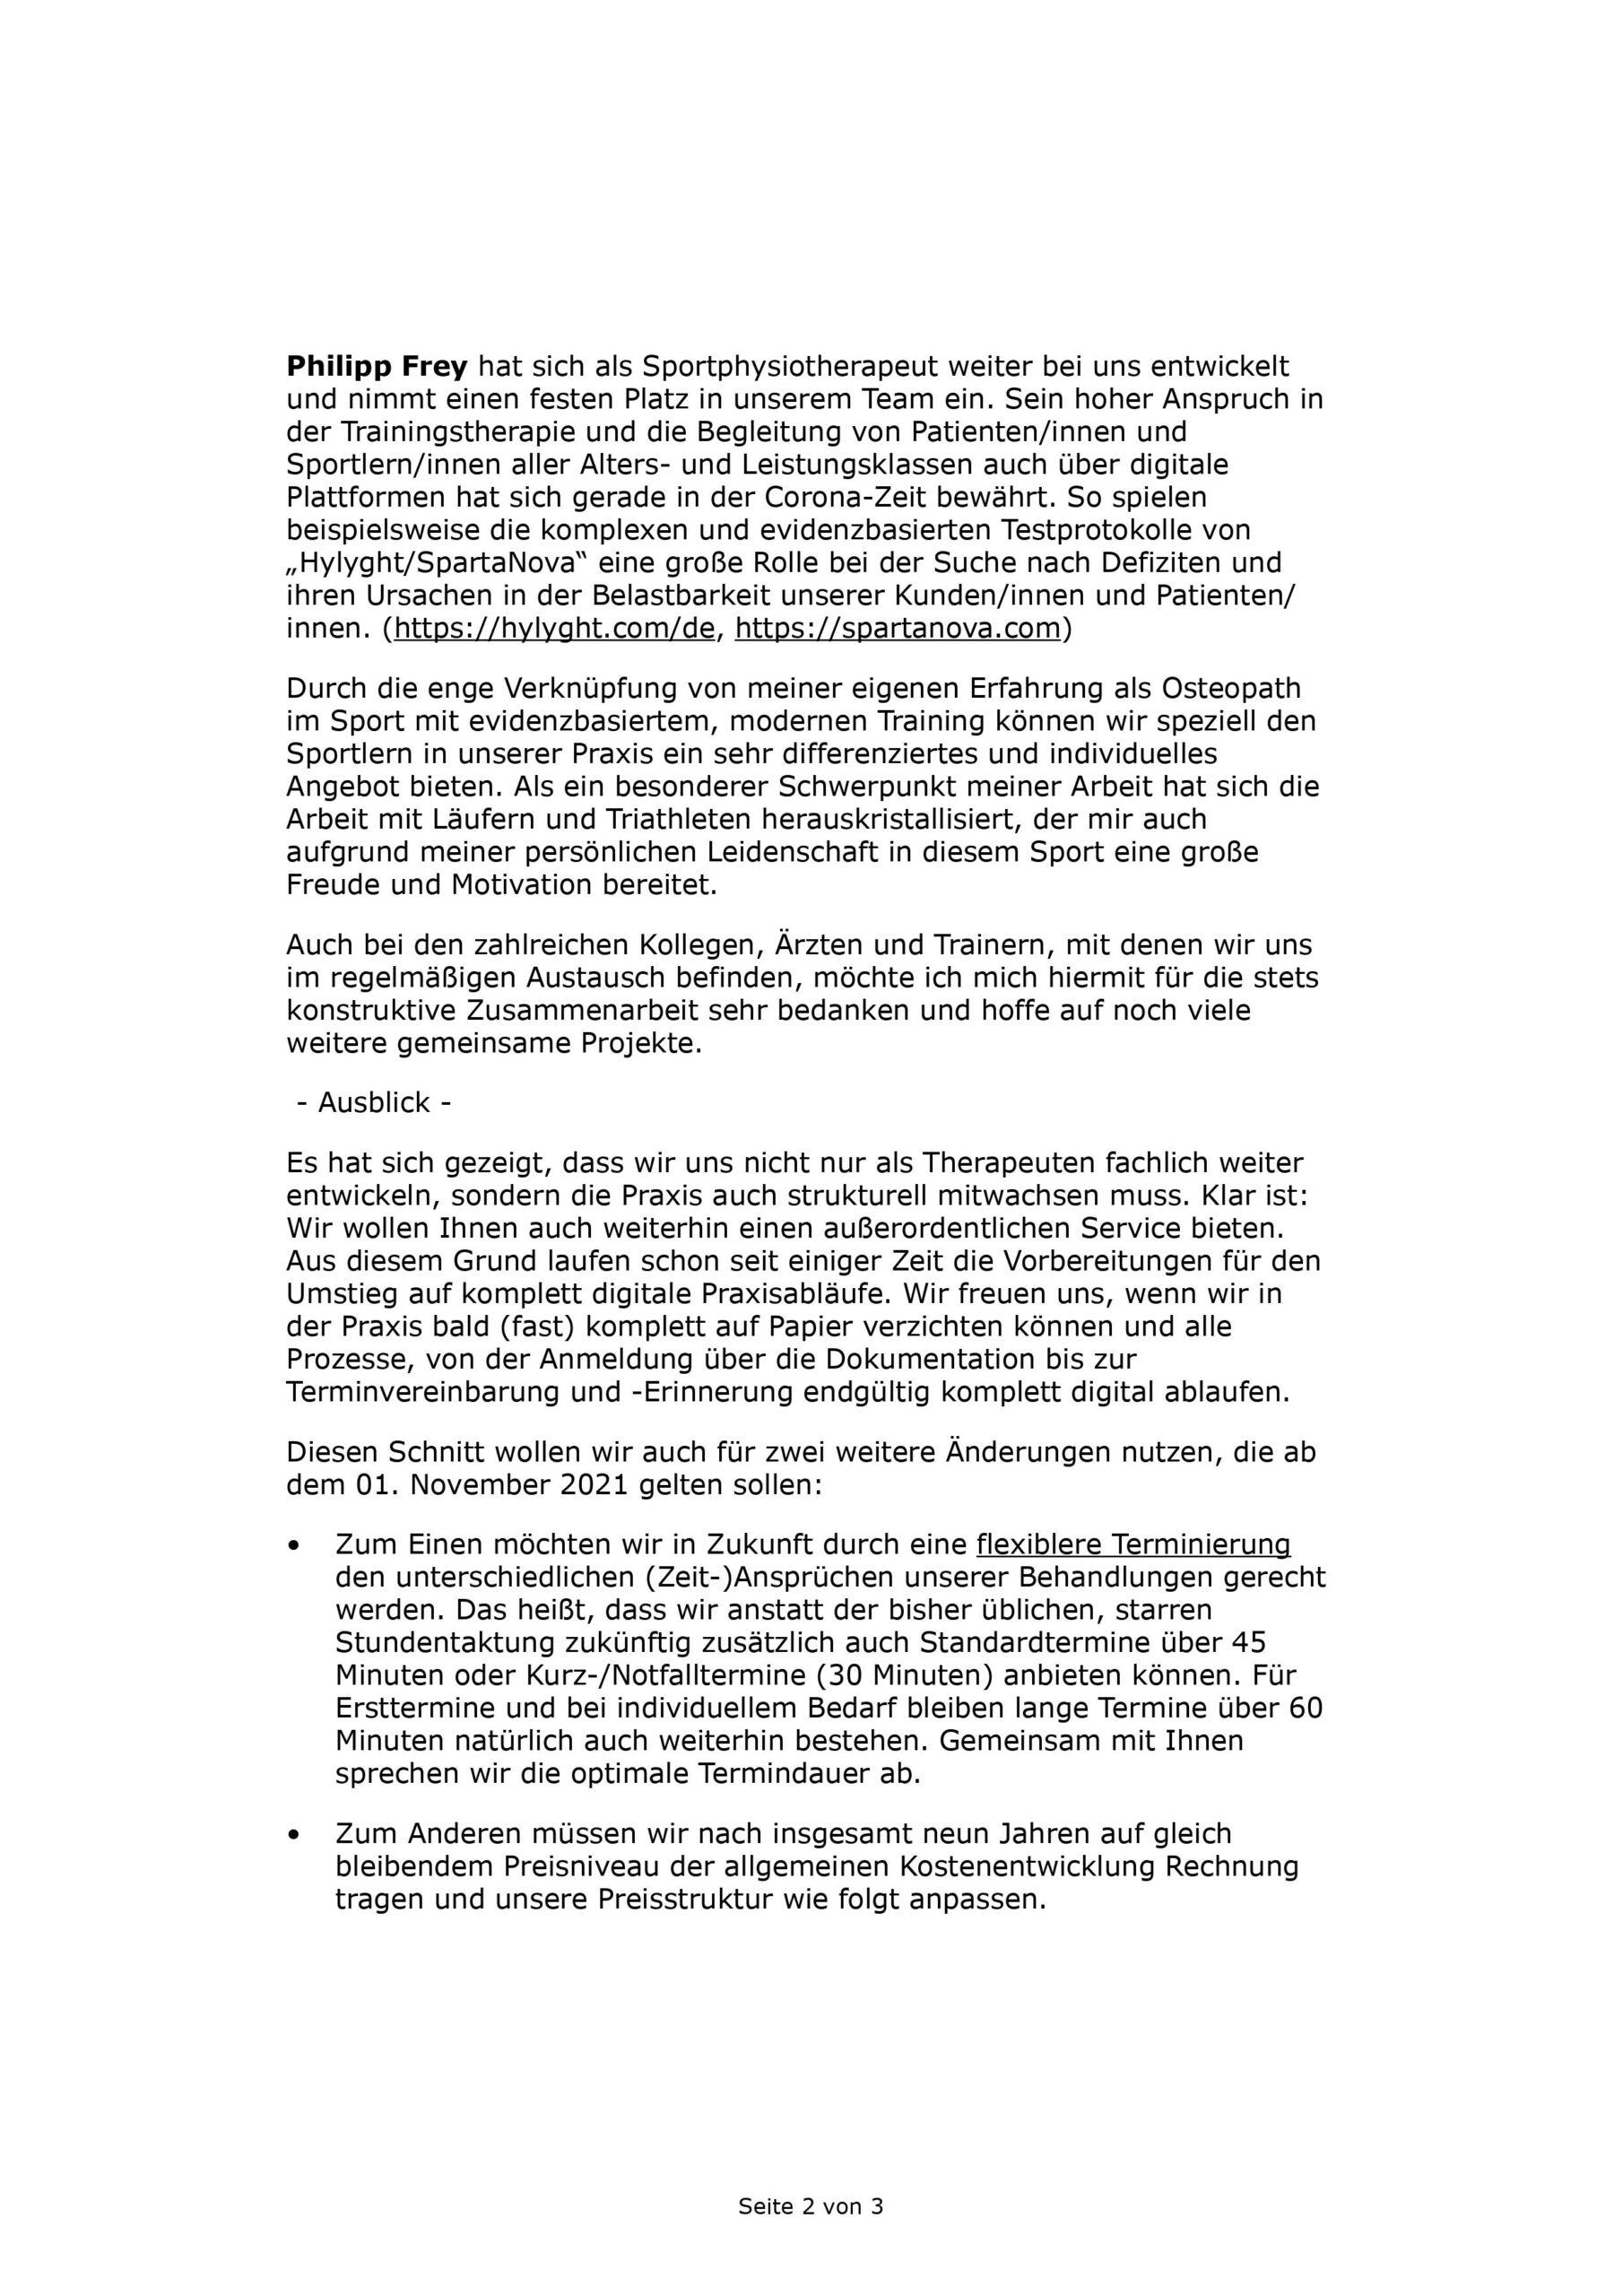 Rückblick - Ausblick - AGB 2021 2/3